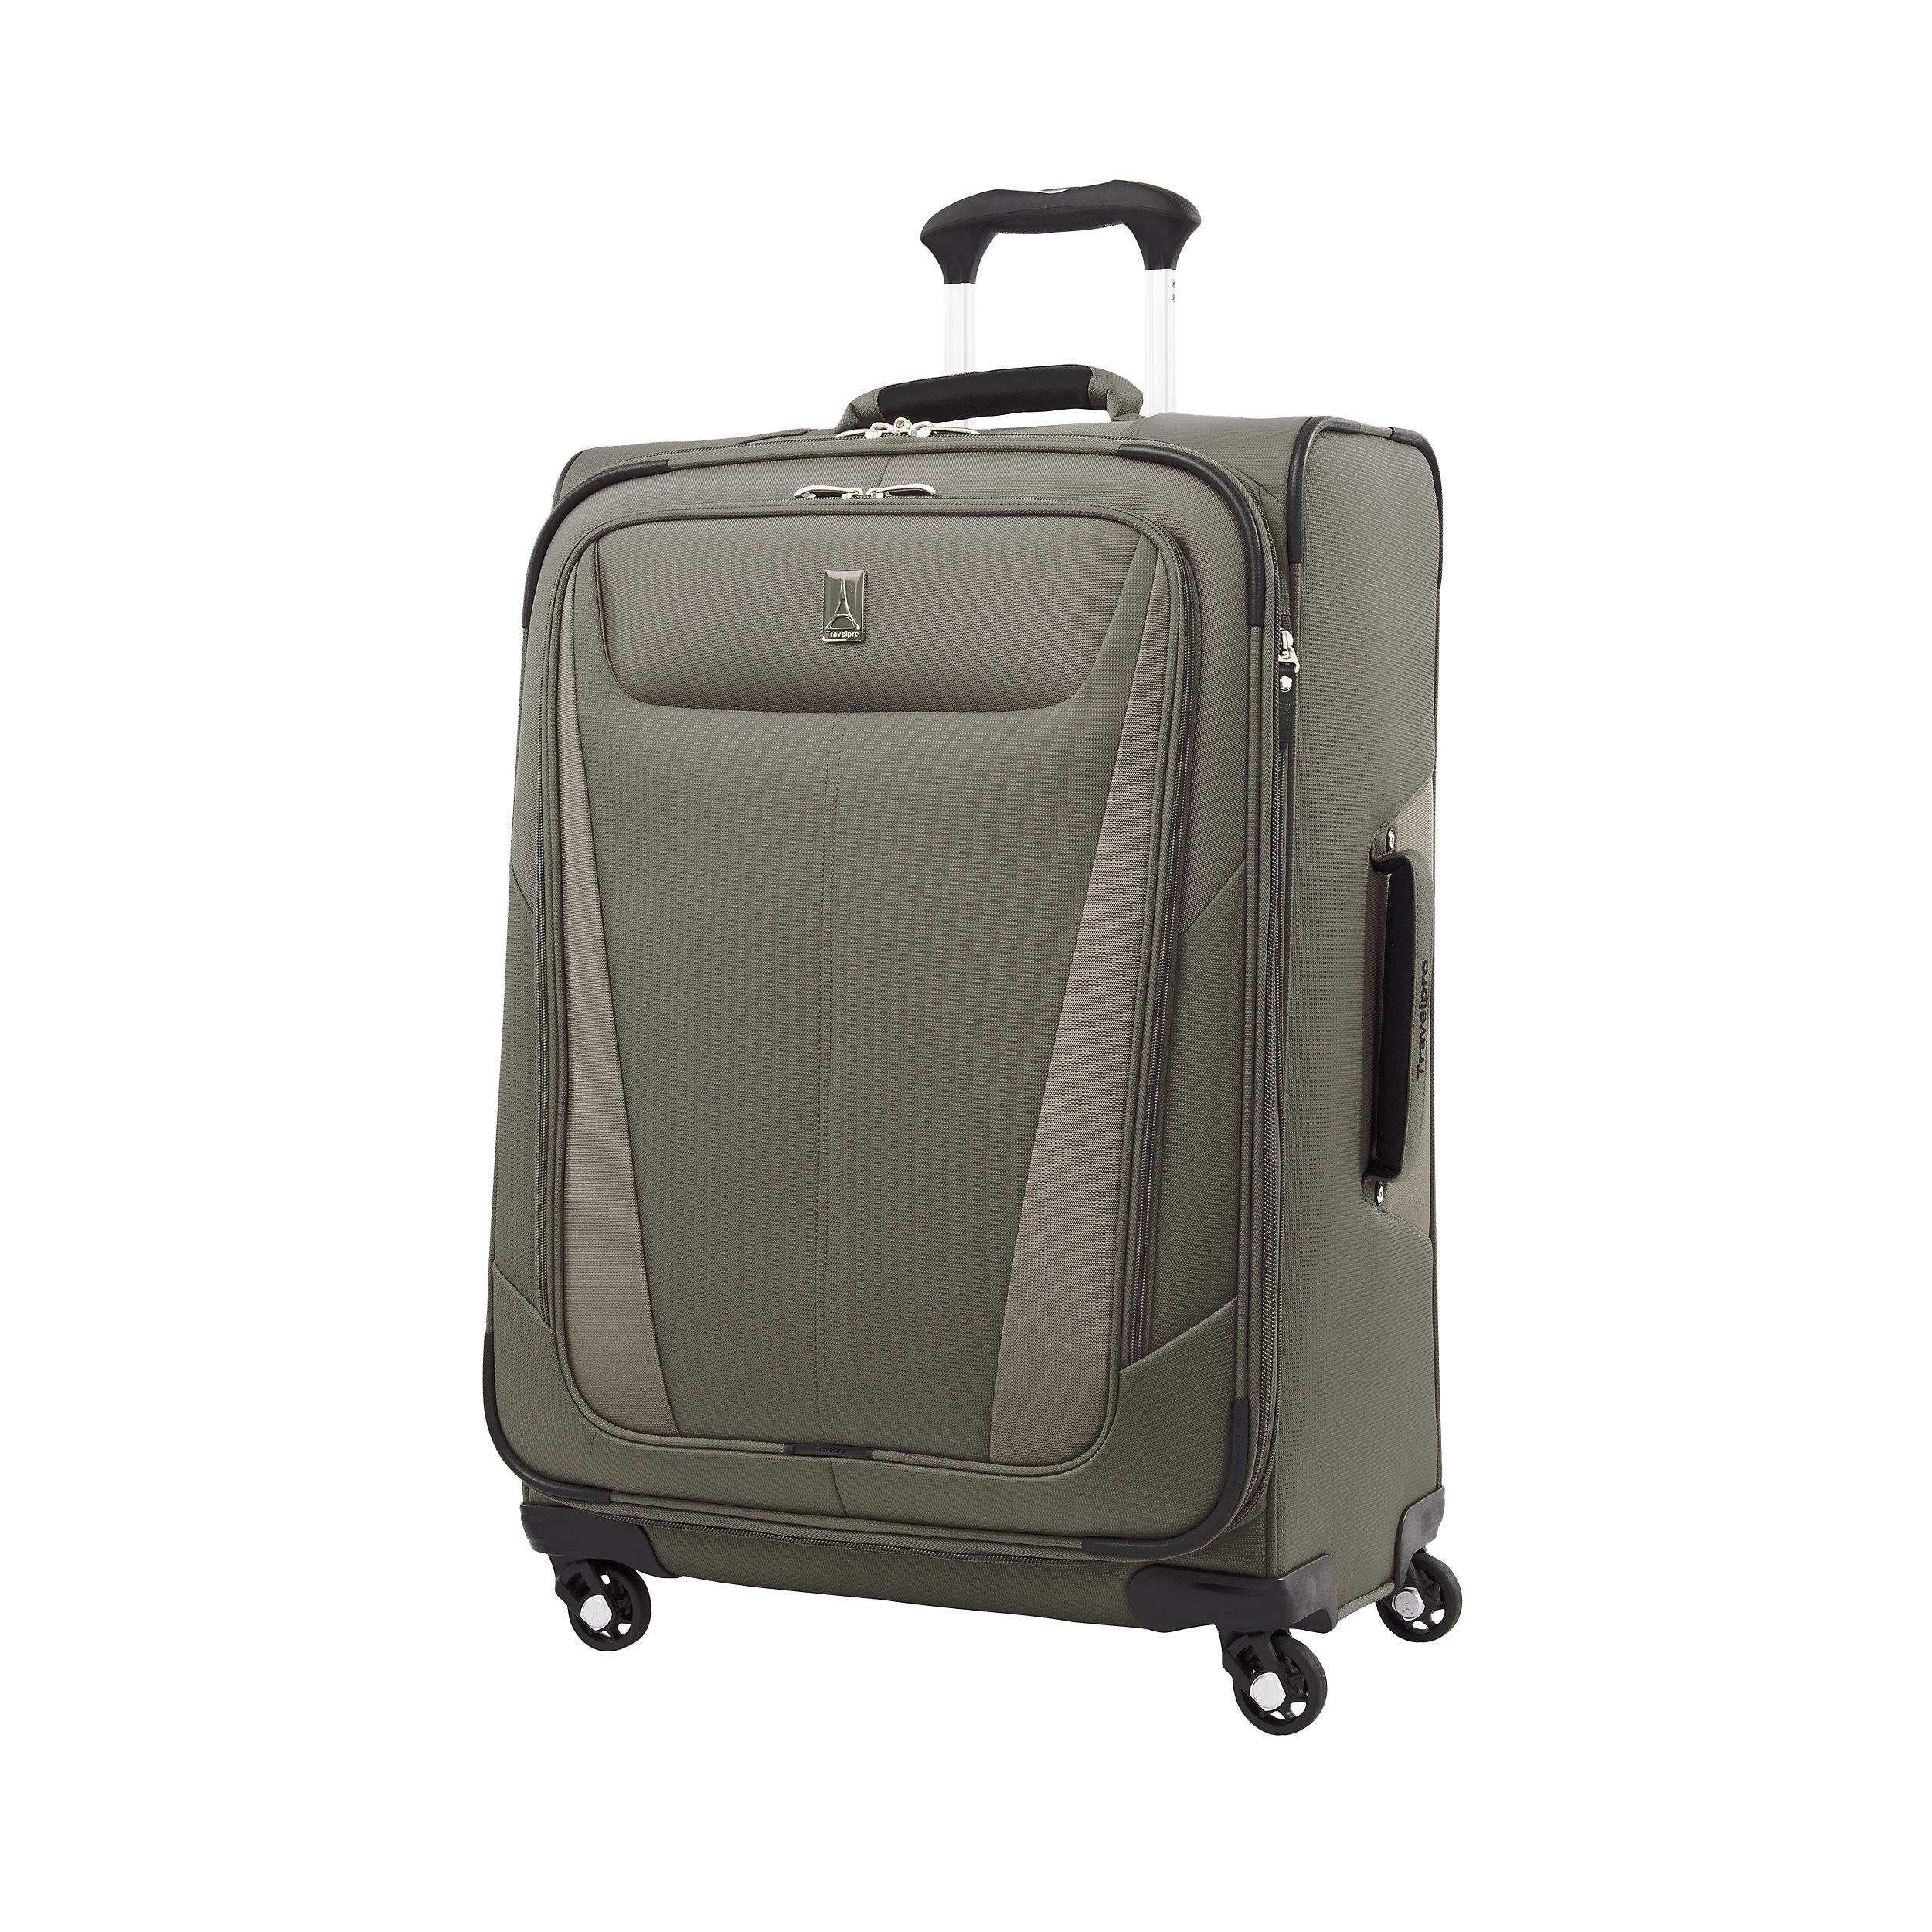 Suitcase with 4 wheels 69 cm Expandable Maxlite 5 Medium 91 Liter